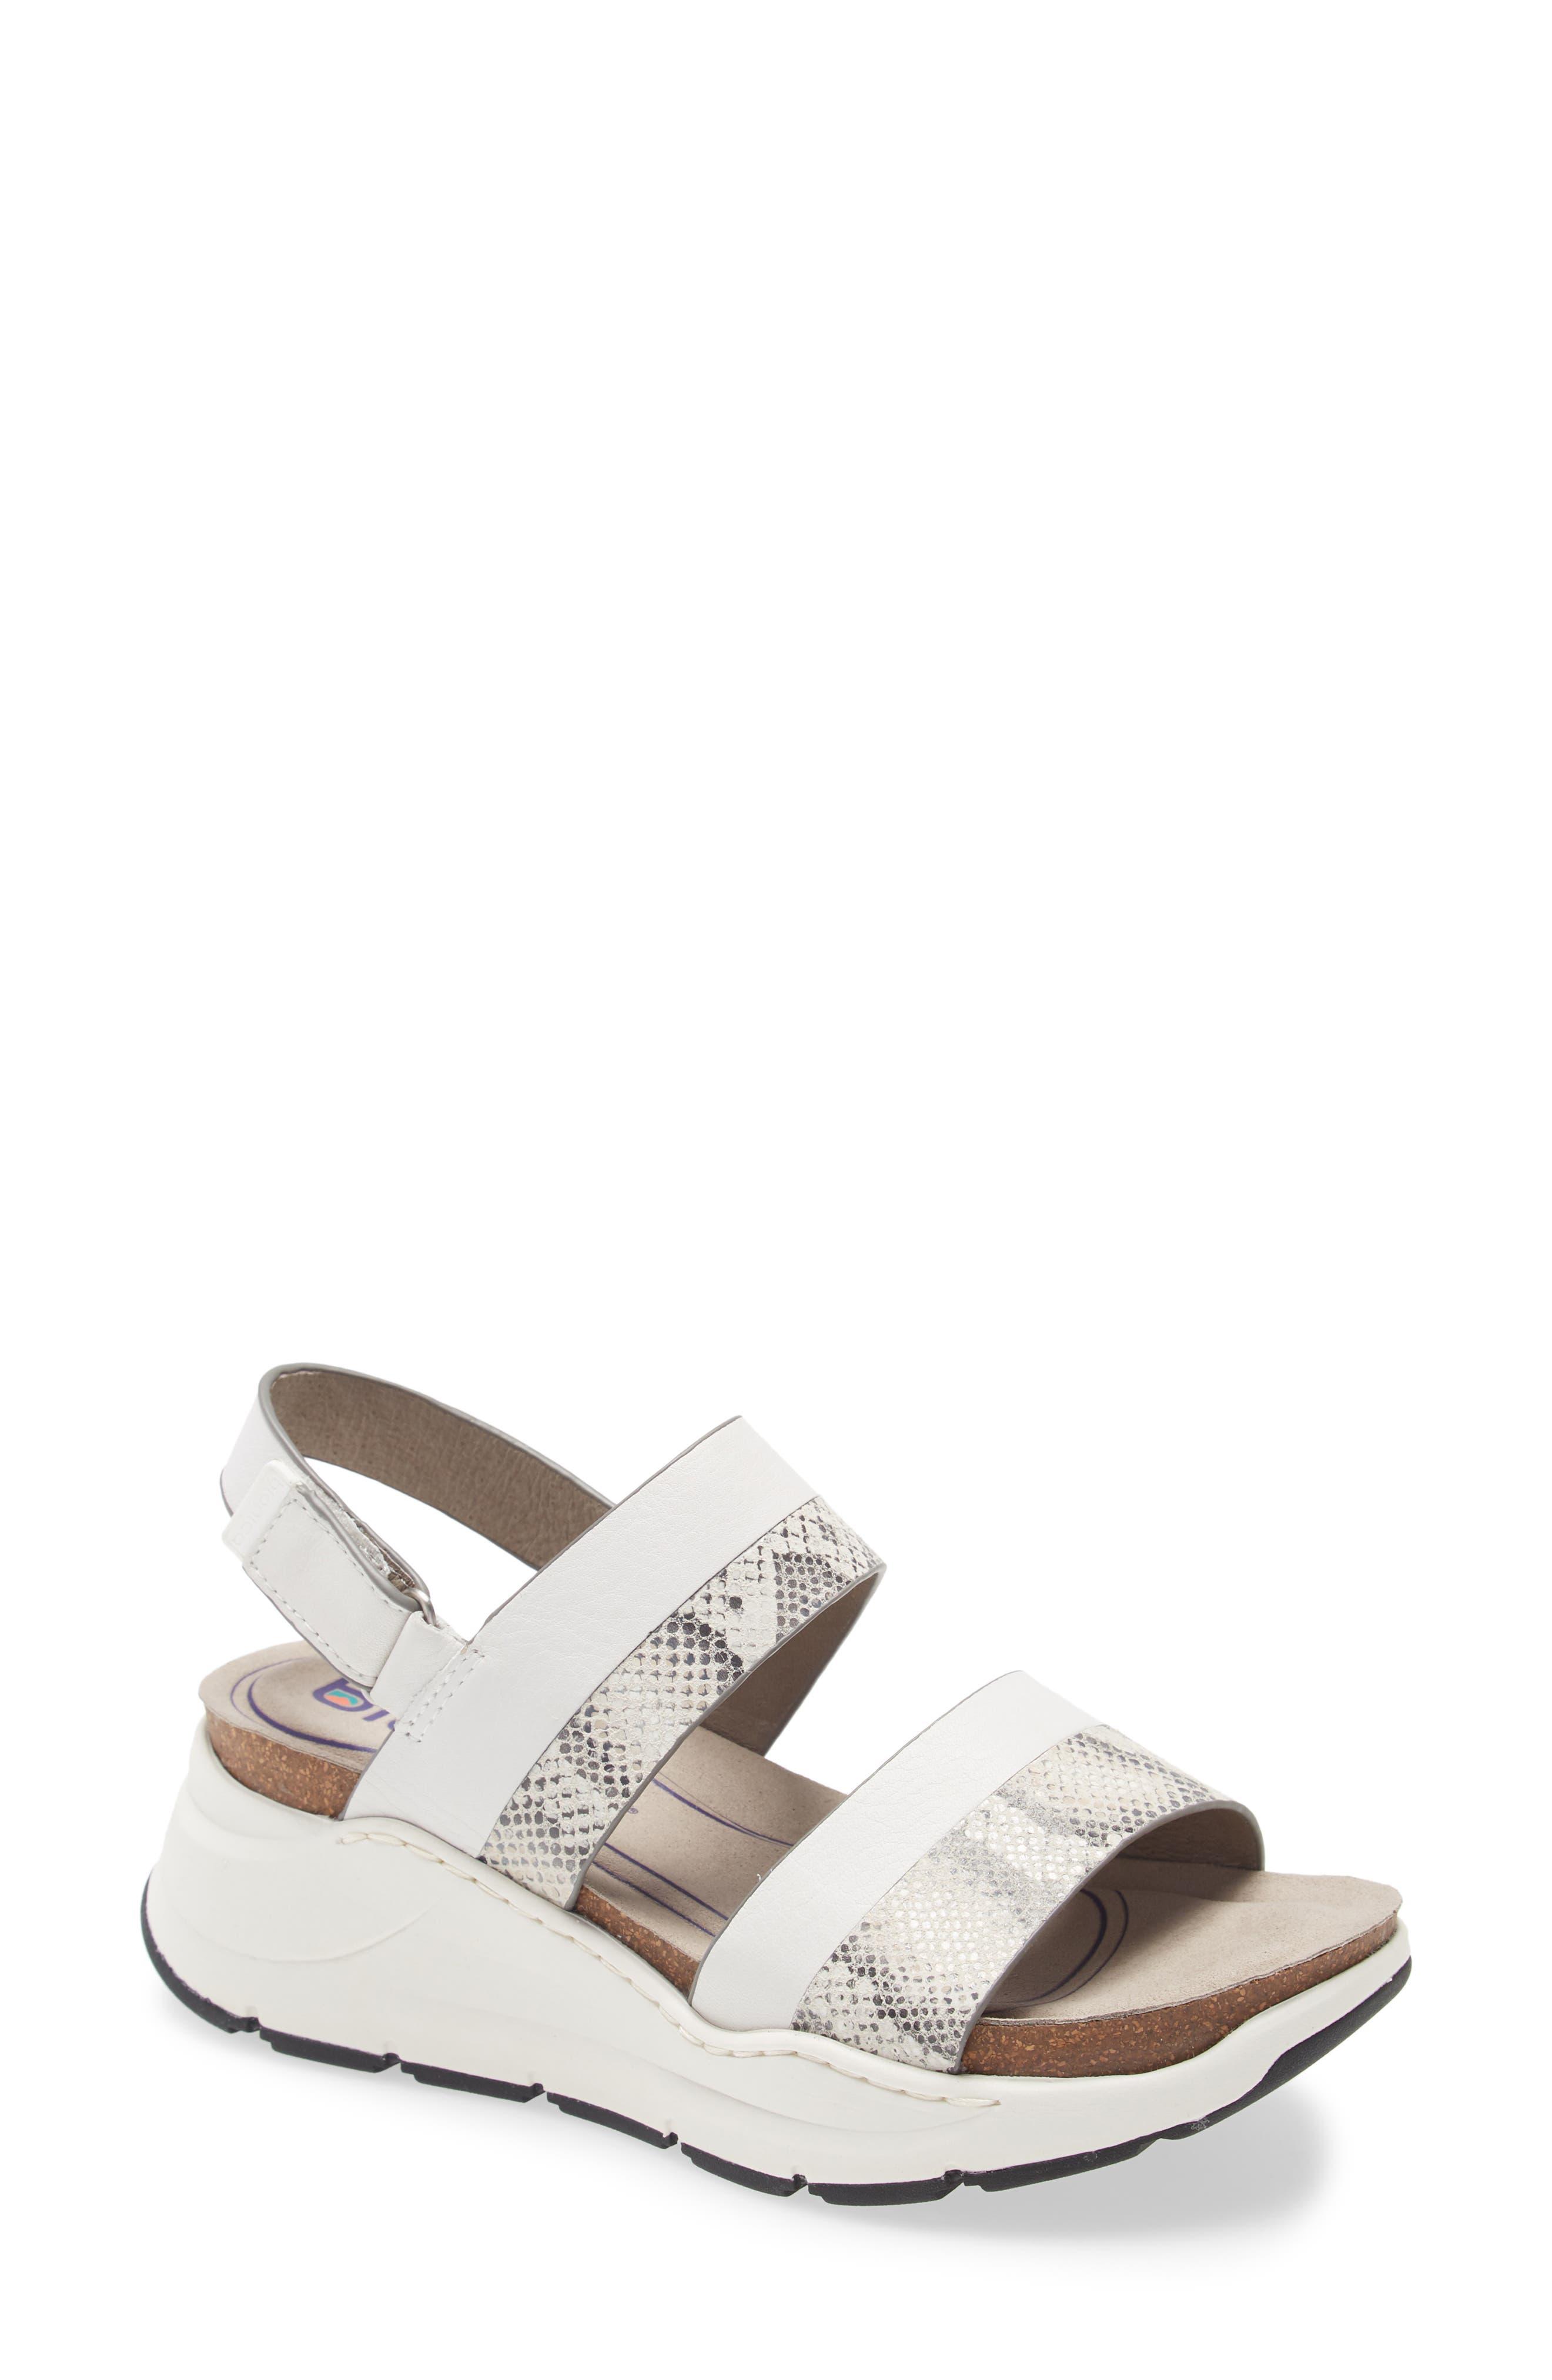 Odelia Slingback Sandal